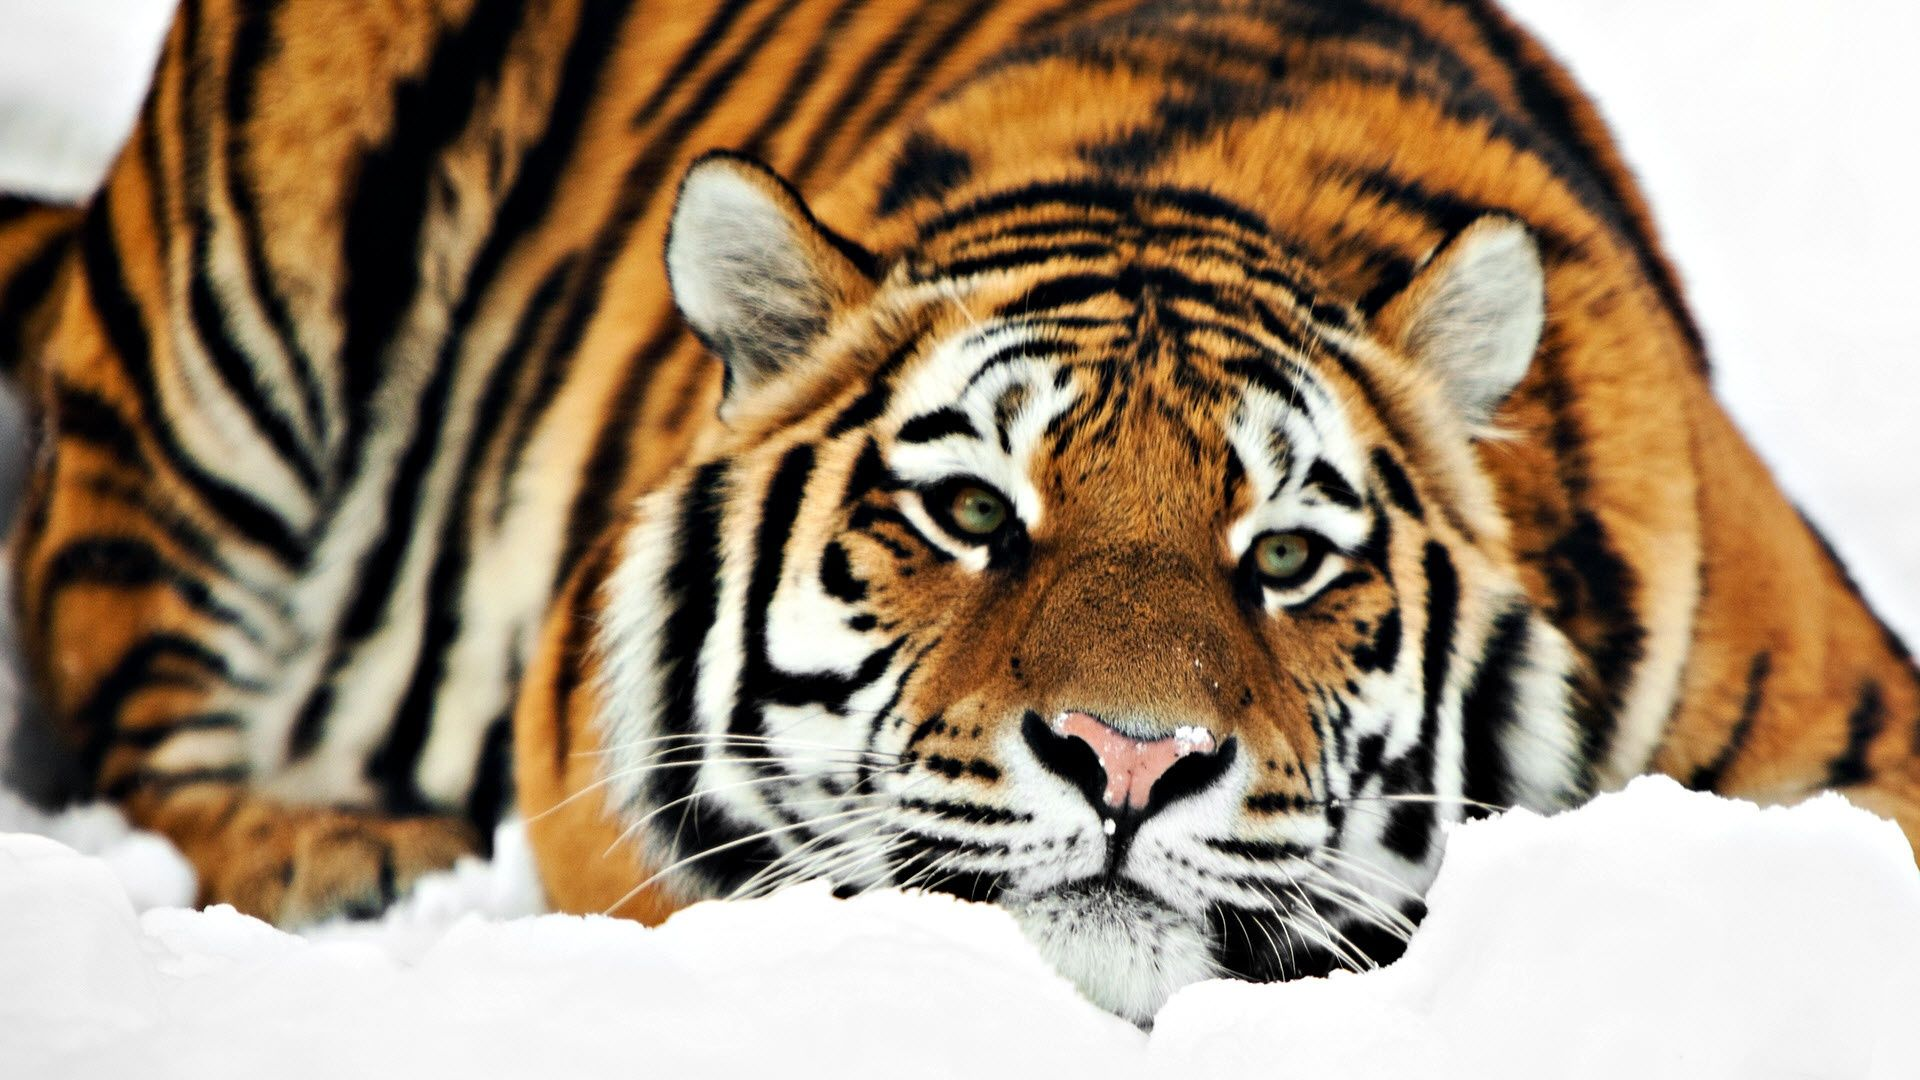 Tiger Hd P Animal Wallpaper